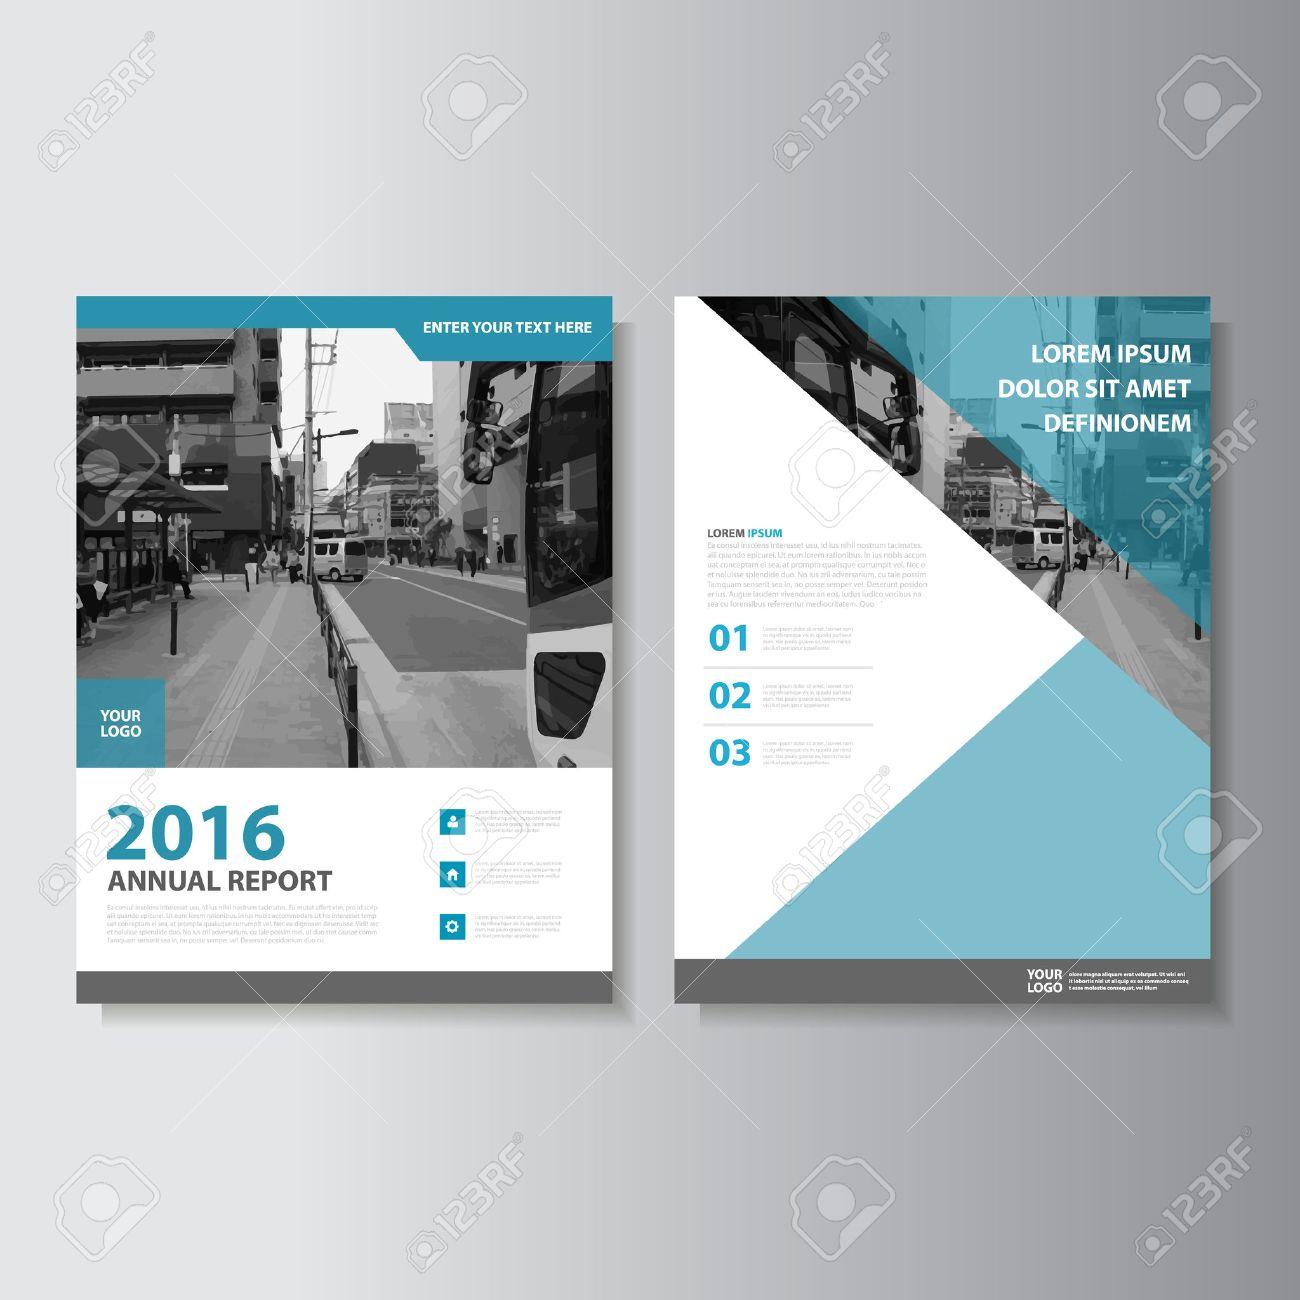 Nett Broschüre Maker Vorlage Bilder - Entry Level Resume Vorlagen ...